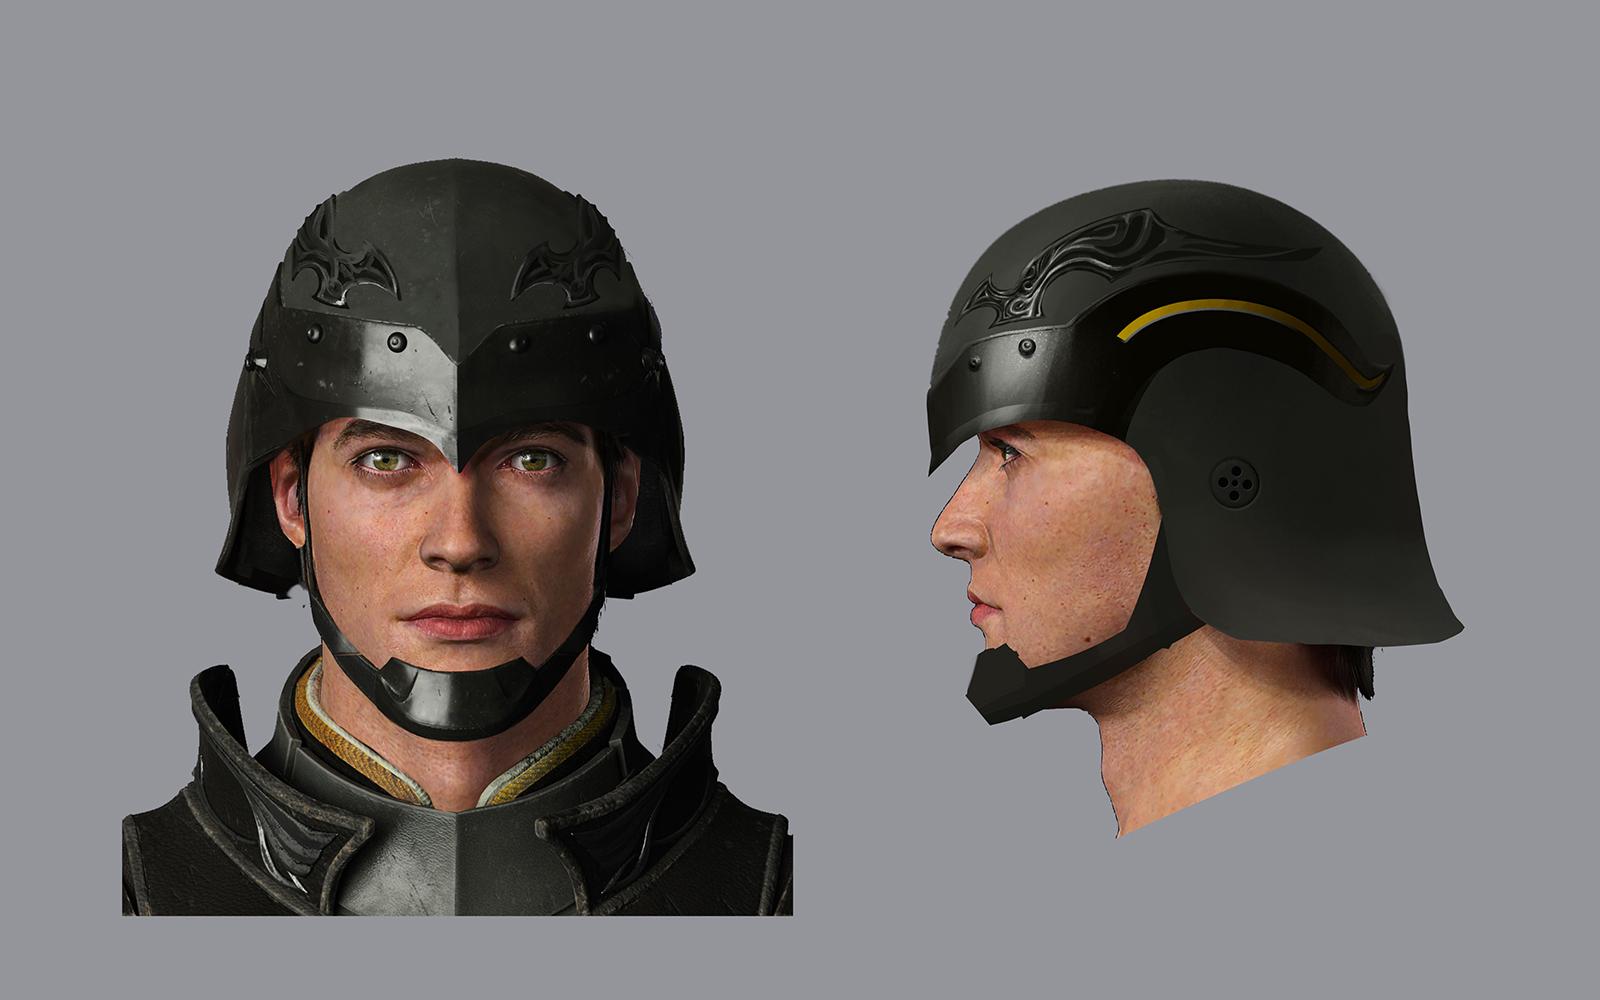 Helmet design for chocobo cavalry